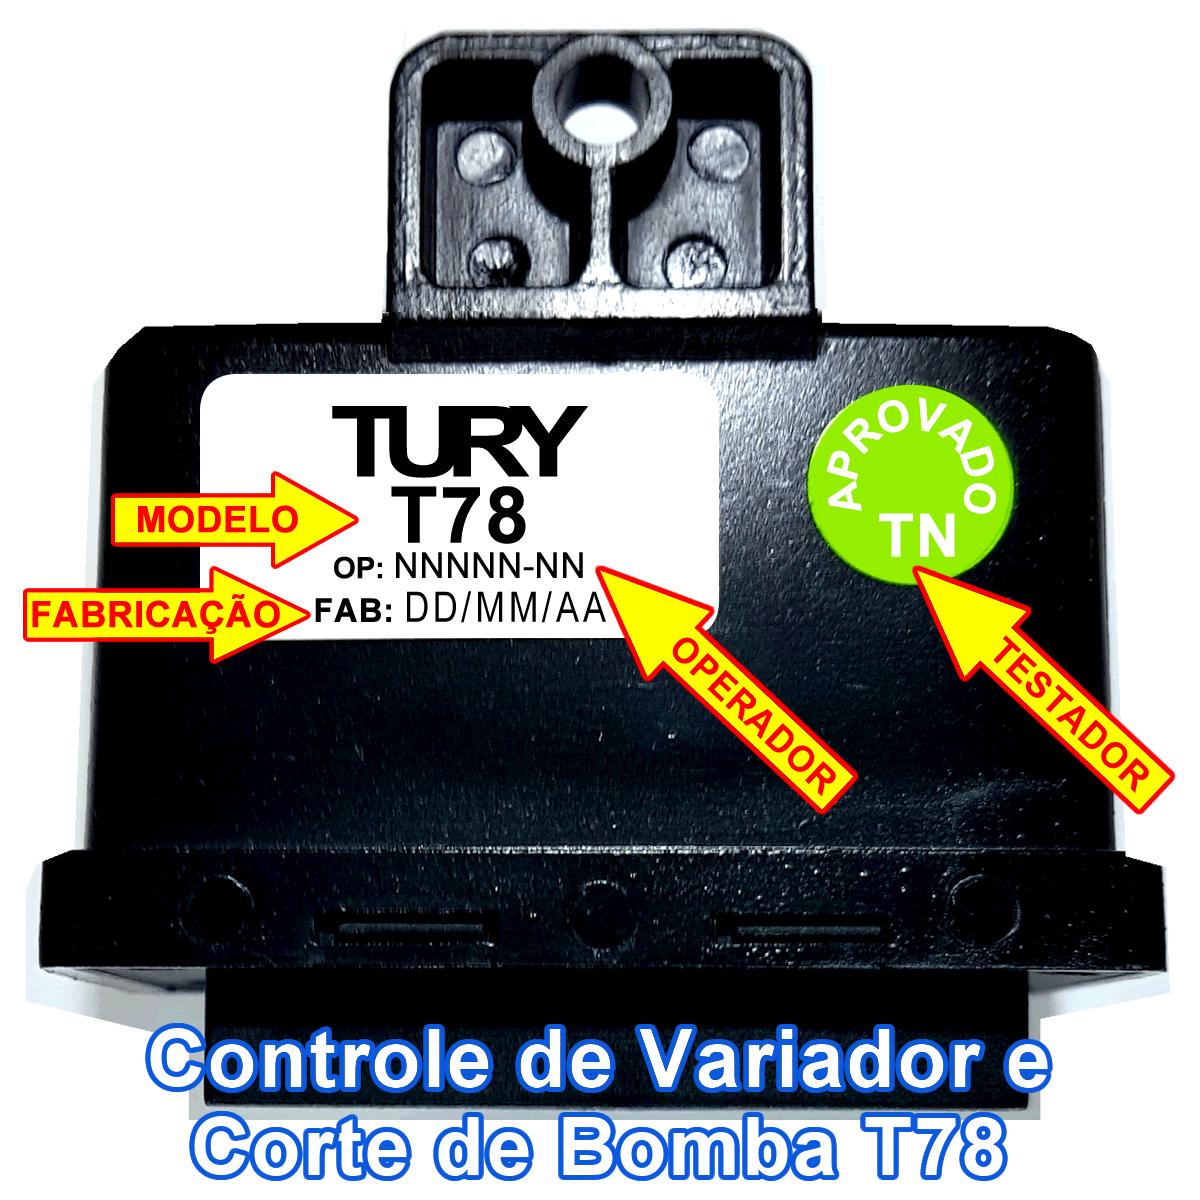 Controlador de Variador e Desliga Bomba T78 TURY GAS